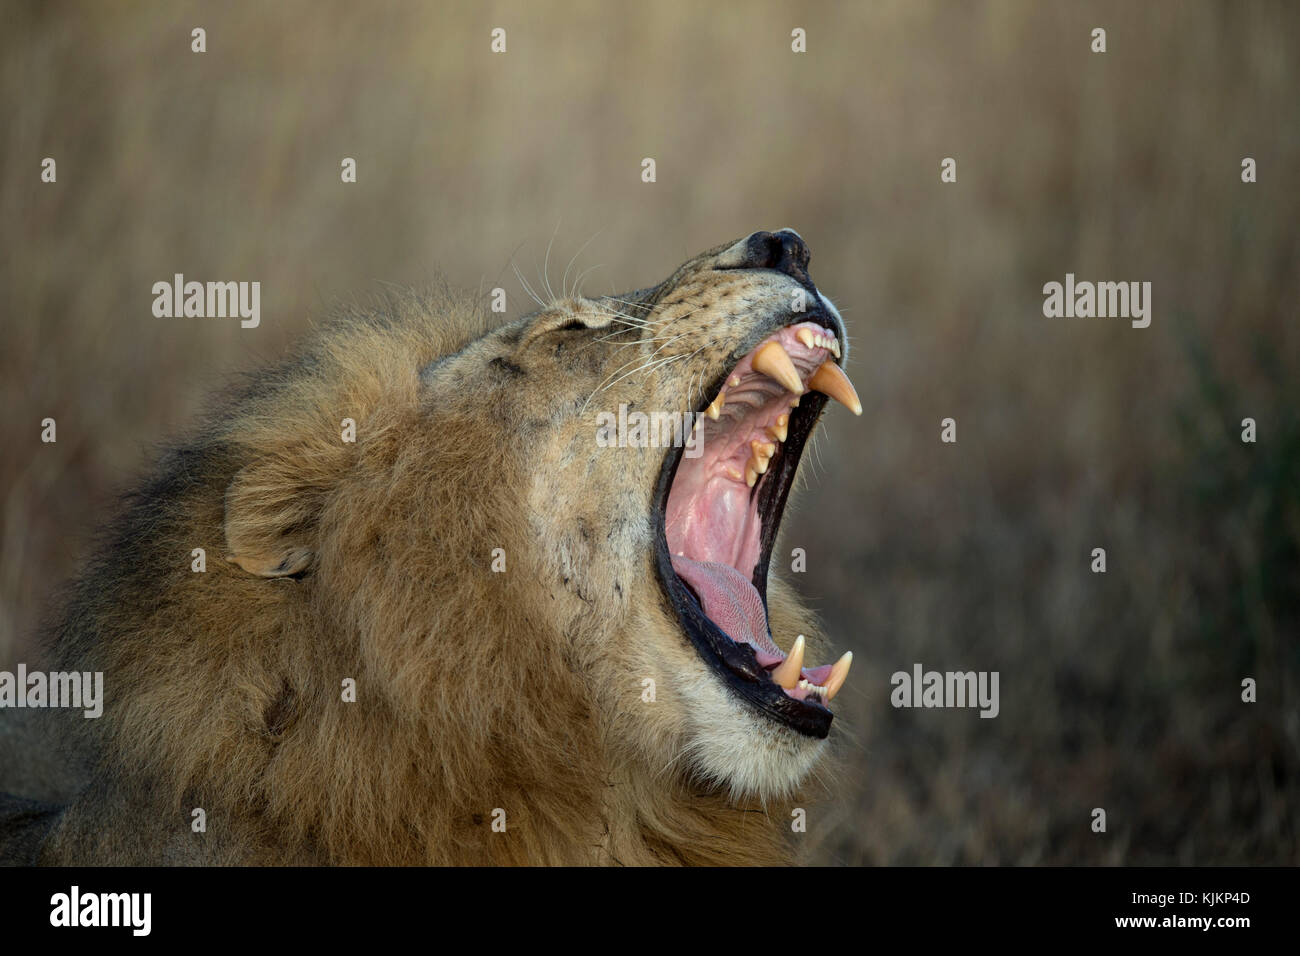 Serengeti National Park. Lion yawning (Panthera leo).  Tanzania. - Stock Image